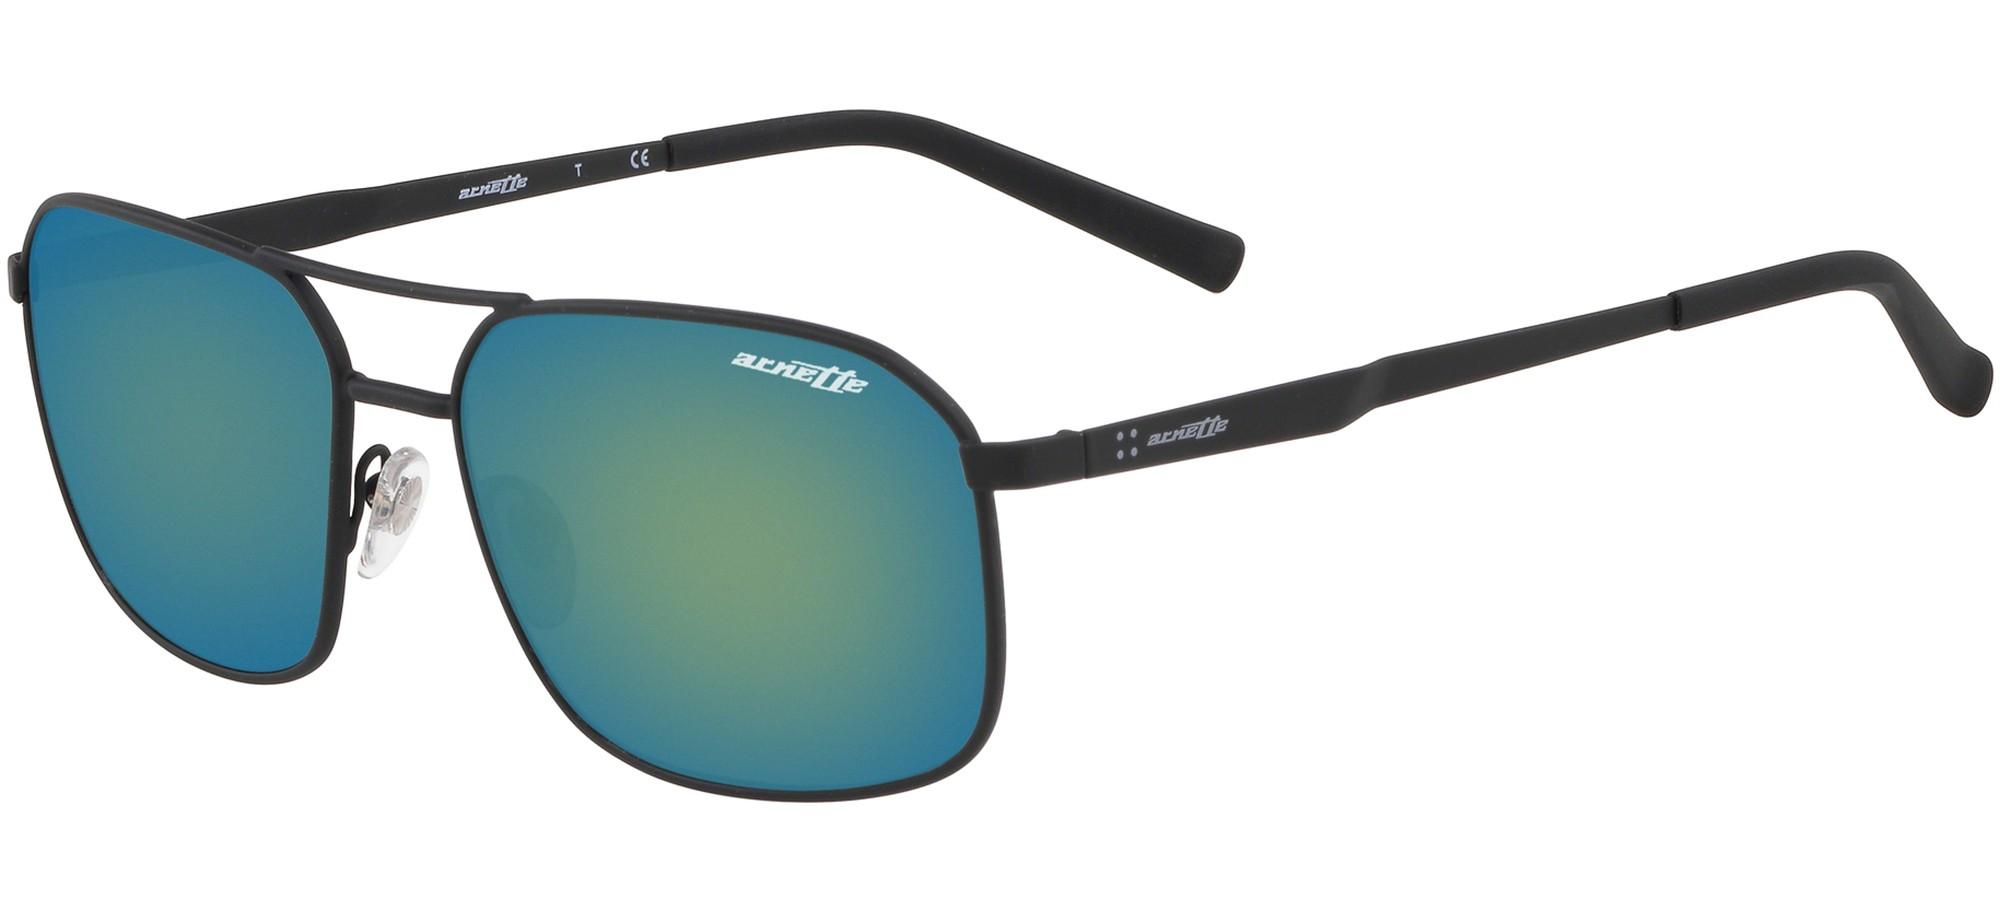 Arnette sunglasses KALLIO AN 3079